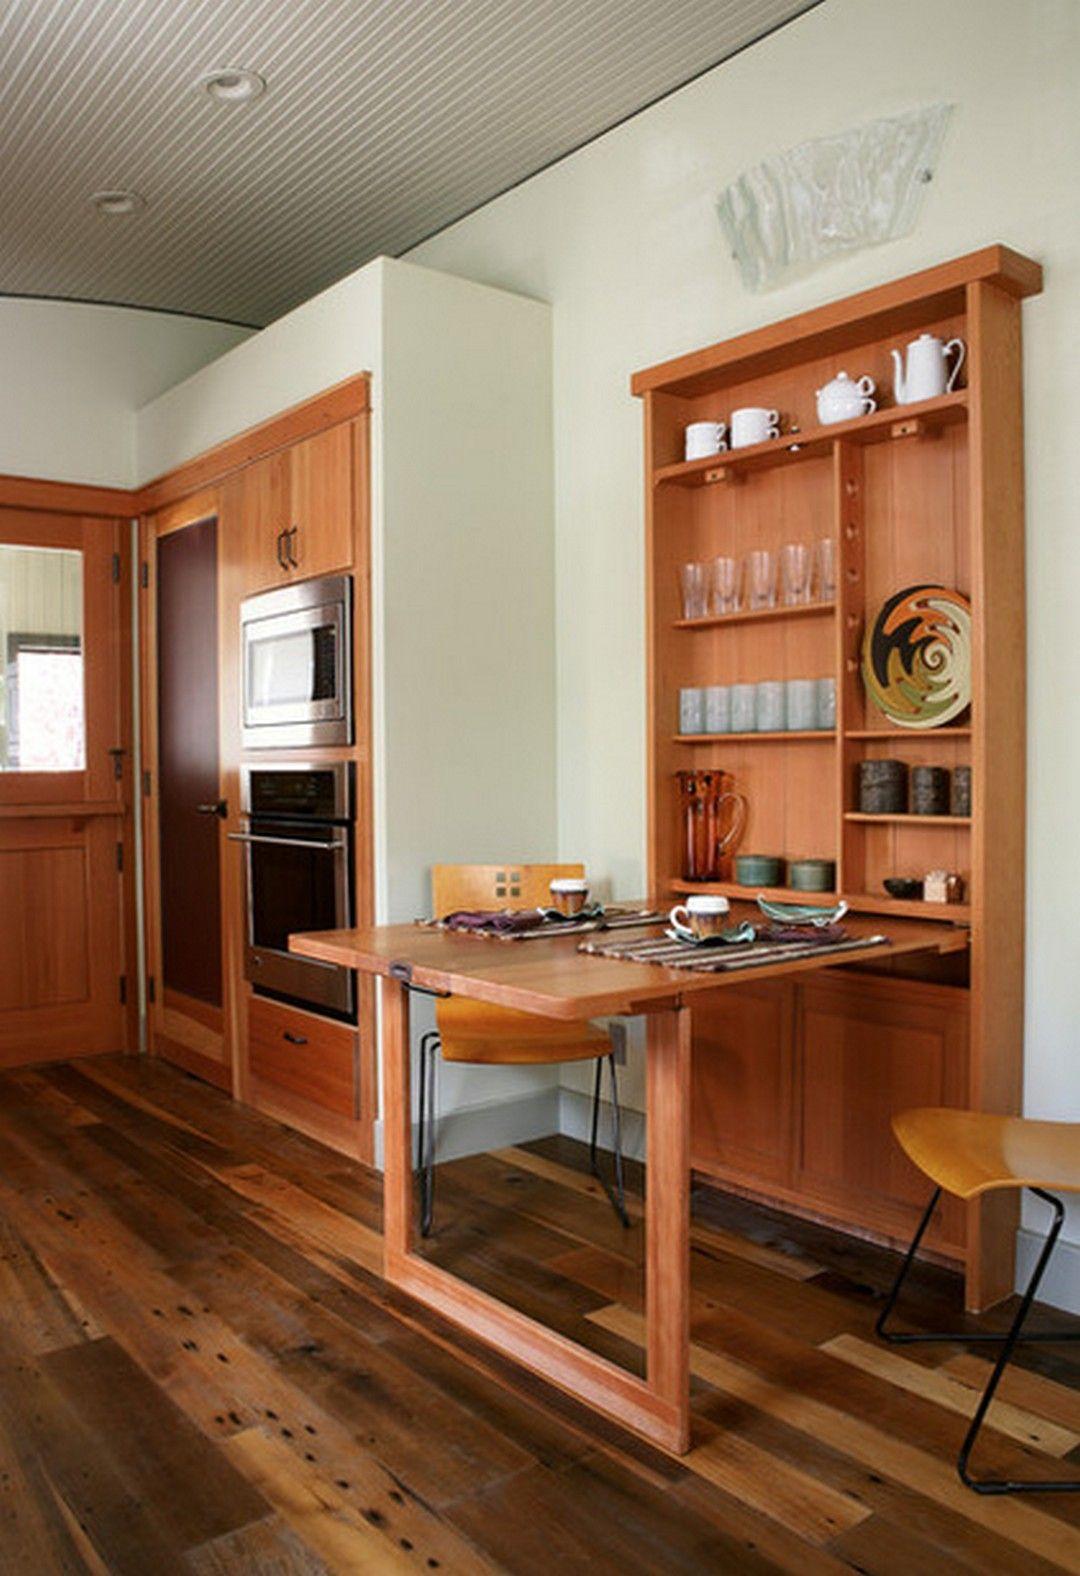 62 DIY Tiny House Storage and Organization Ideas On A Budget